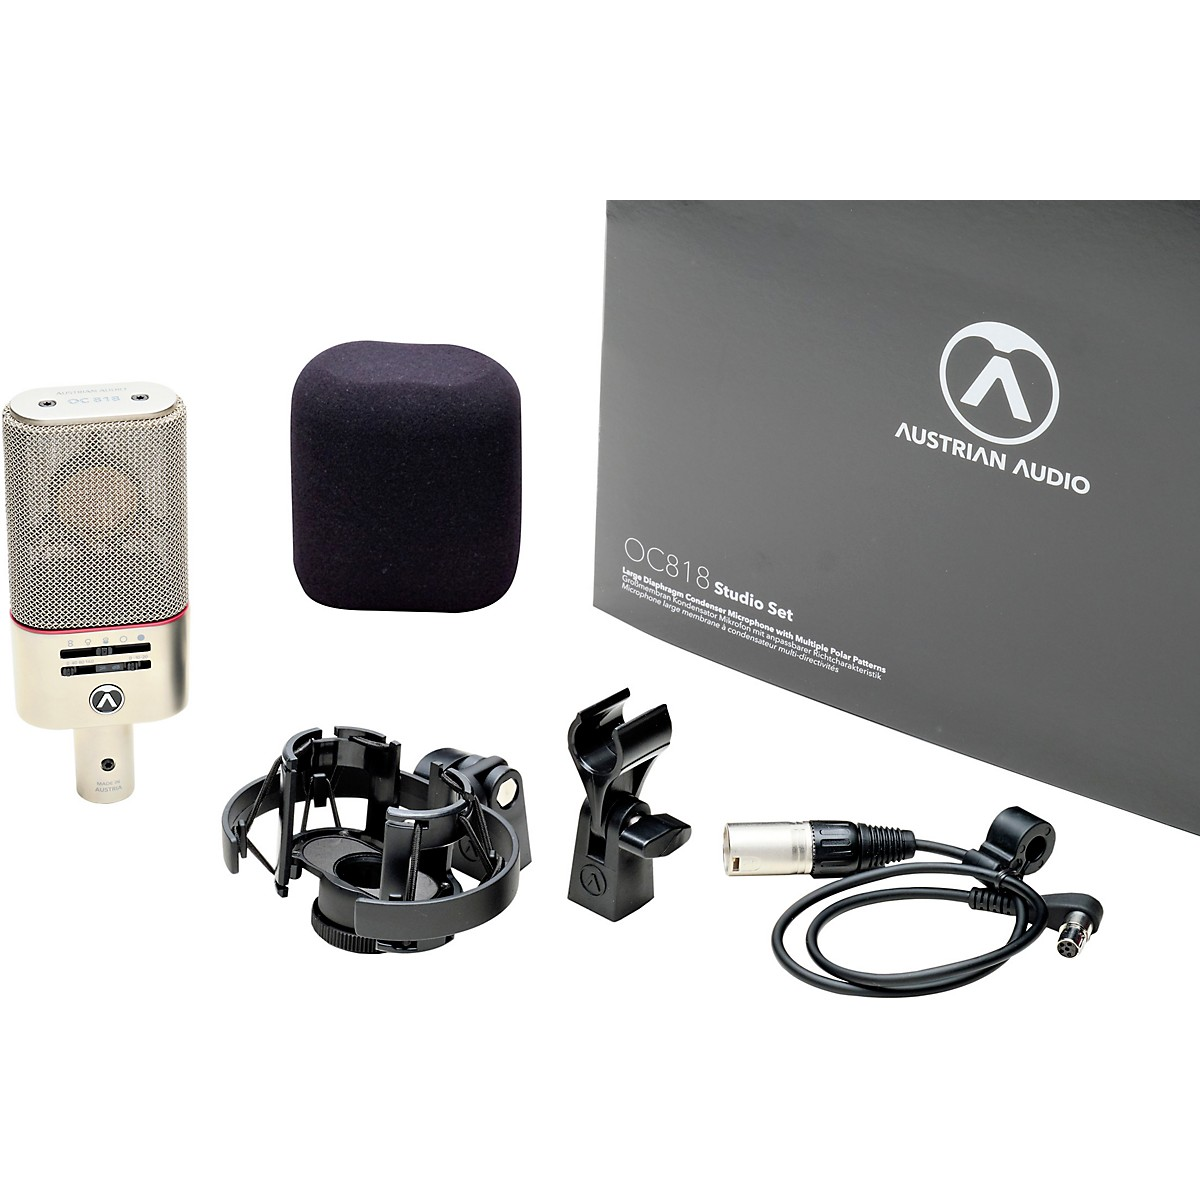 Austrian Audio OC818 Multi-pattern Large-diaphragm Condenser Microphone - Studio Set